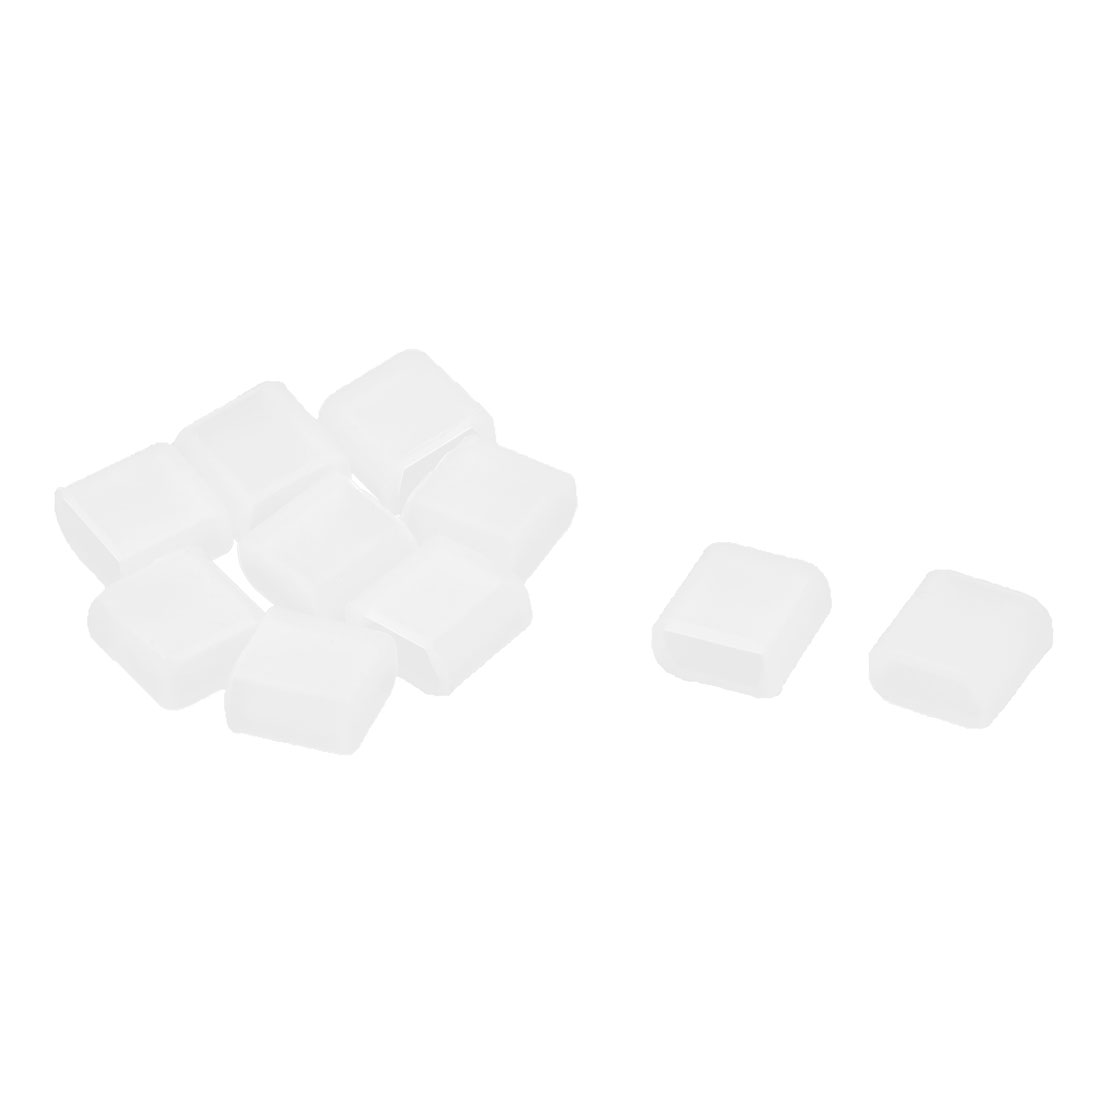 Rubber Mini USB Port Anti Dust Plugs Protector Cover Cap Clear 10PCS